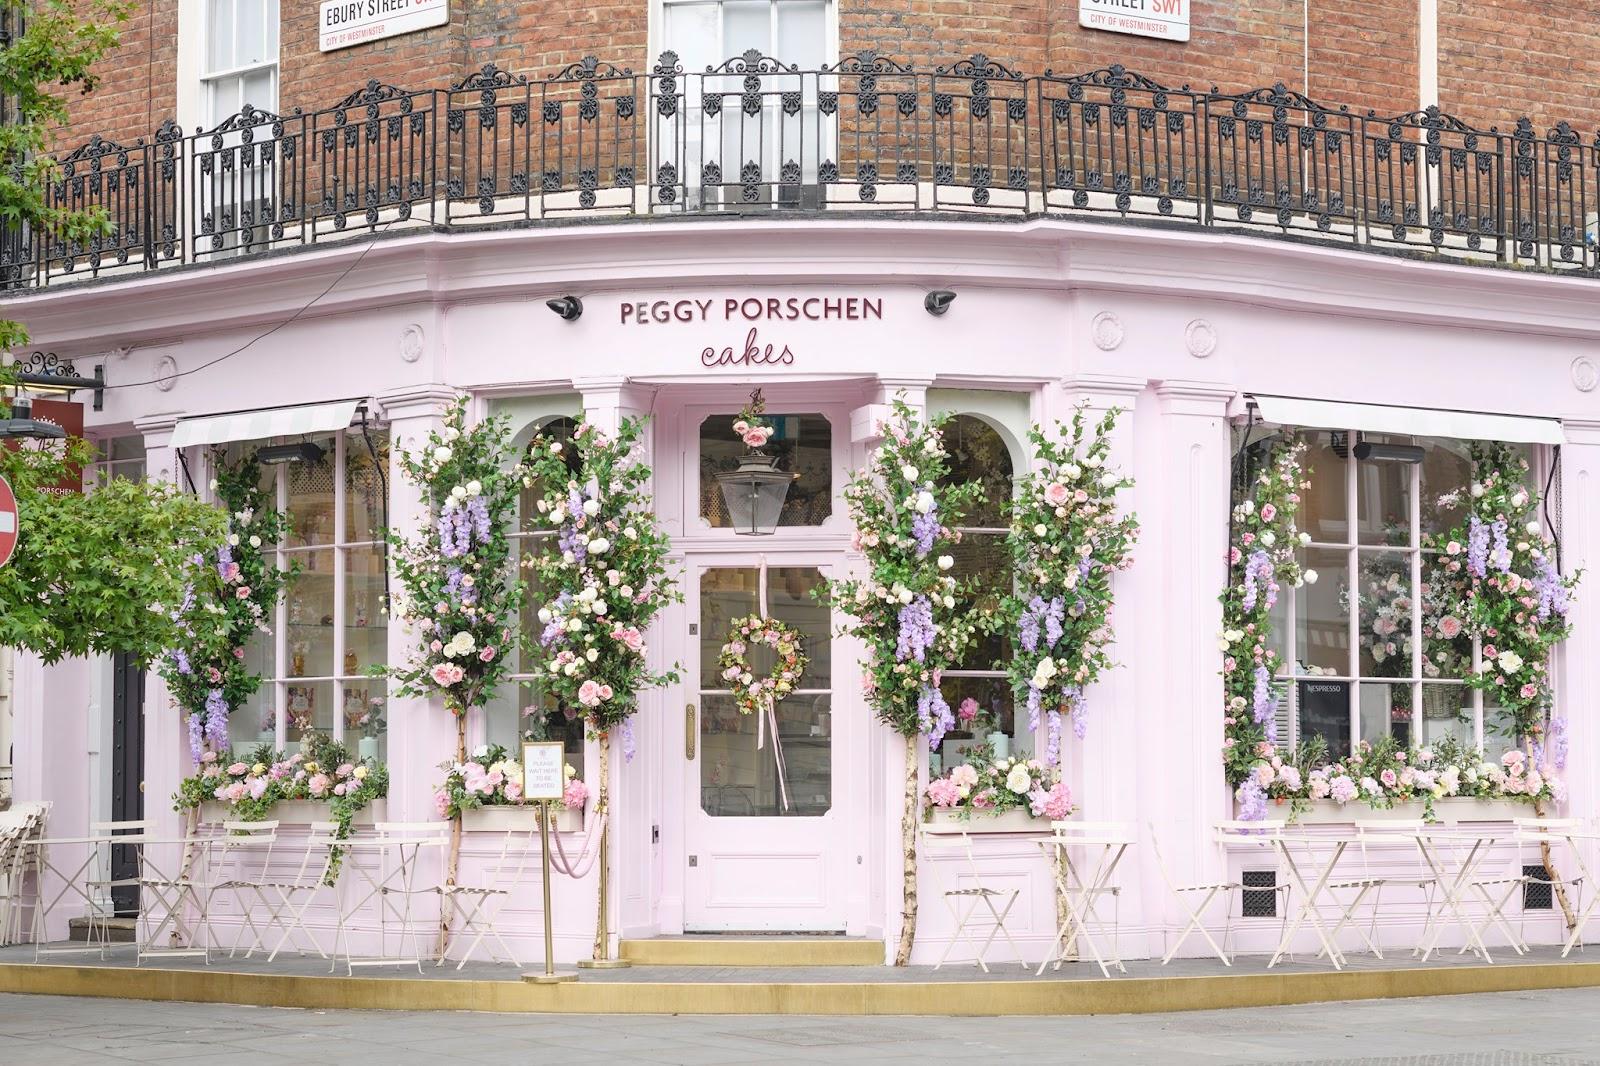 10 places in london to satisfy your sweet tooth 10 Places in London to Satisfy Your Sweet Tooth OucN QboqkWubTw1aCkjU0wLZpFBy5wWOPNVjSU59TM BuJ0Zx uRAa9xChWcmCPzHgzLu5q6lf0dUIlG0jq3pwVtikJUzPpQY Lmdr o0X4H8v3BSJUbWp95Dse2ZDG6 BaLOAe